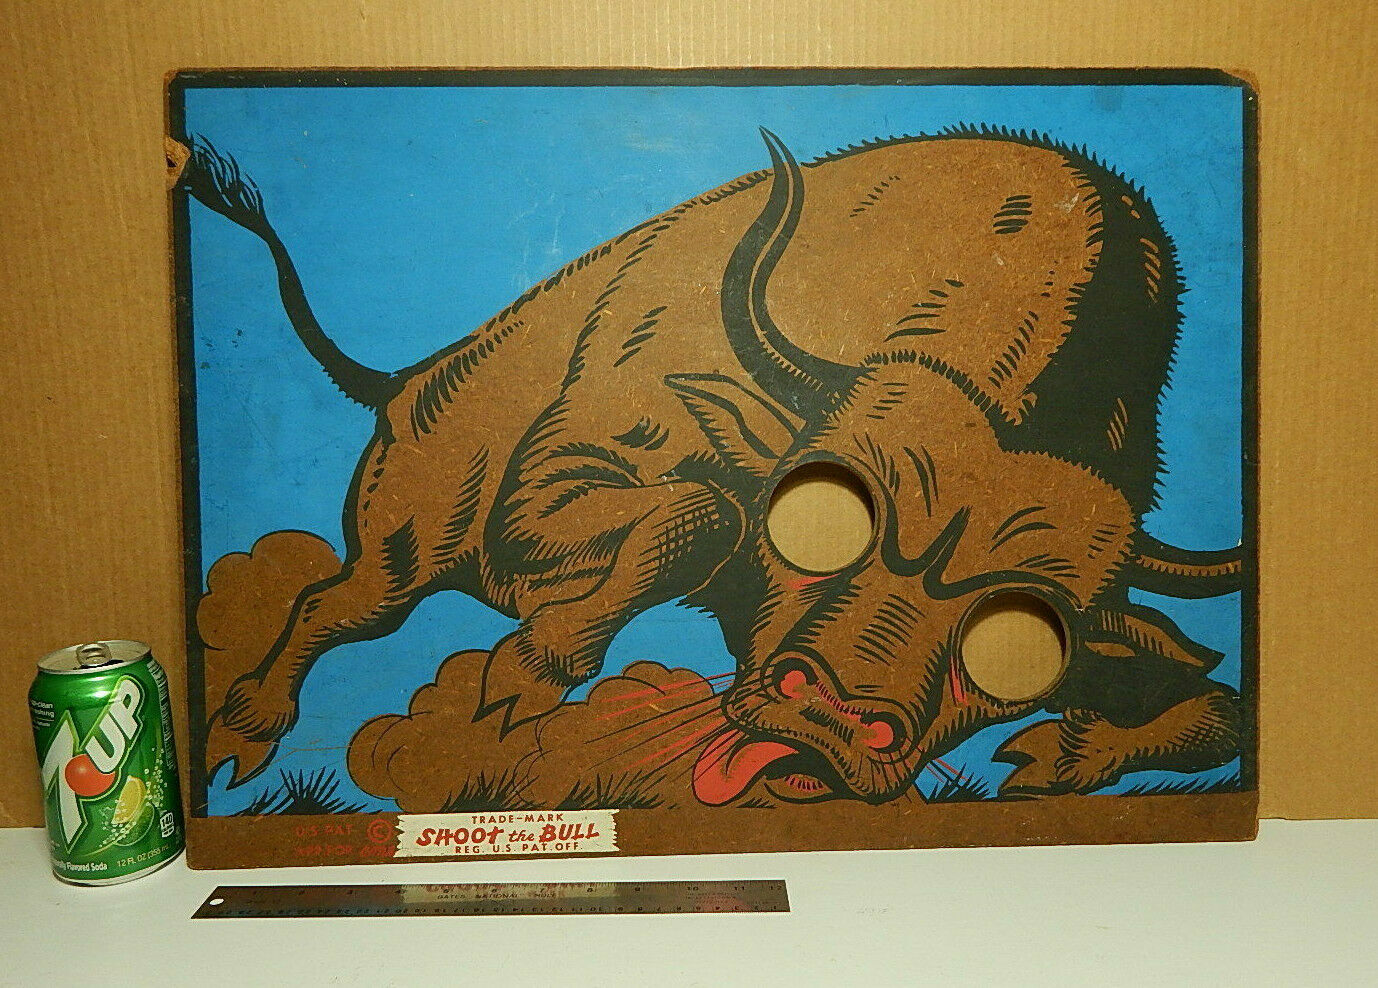 Vintage Westen Cowboy 1940er Jahre Shoot The Bull Bean Tasche Toss Adult Game Bar Sign